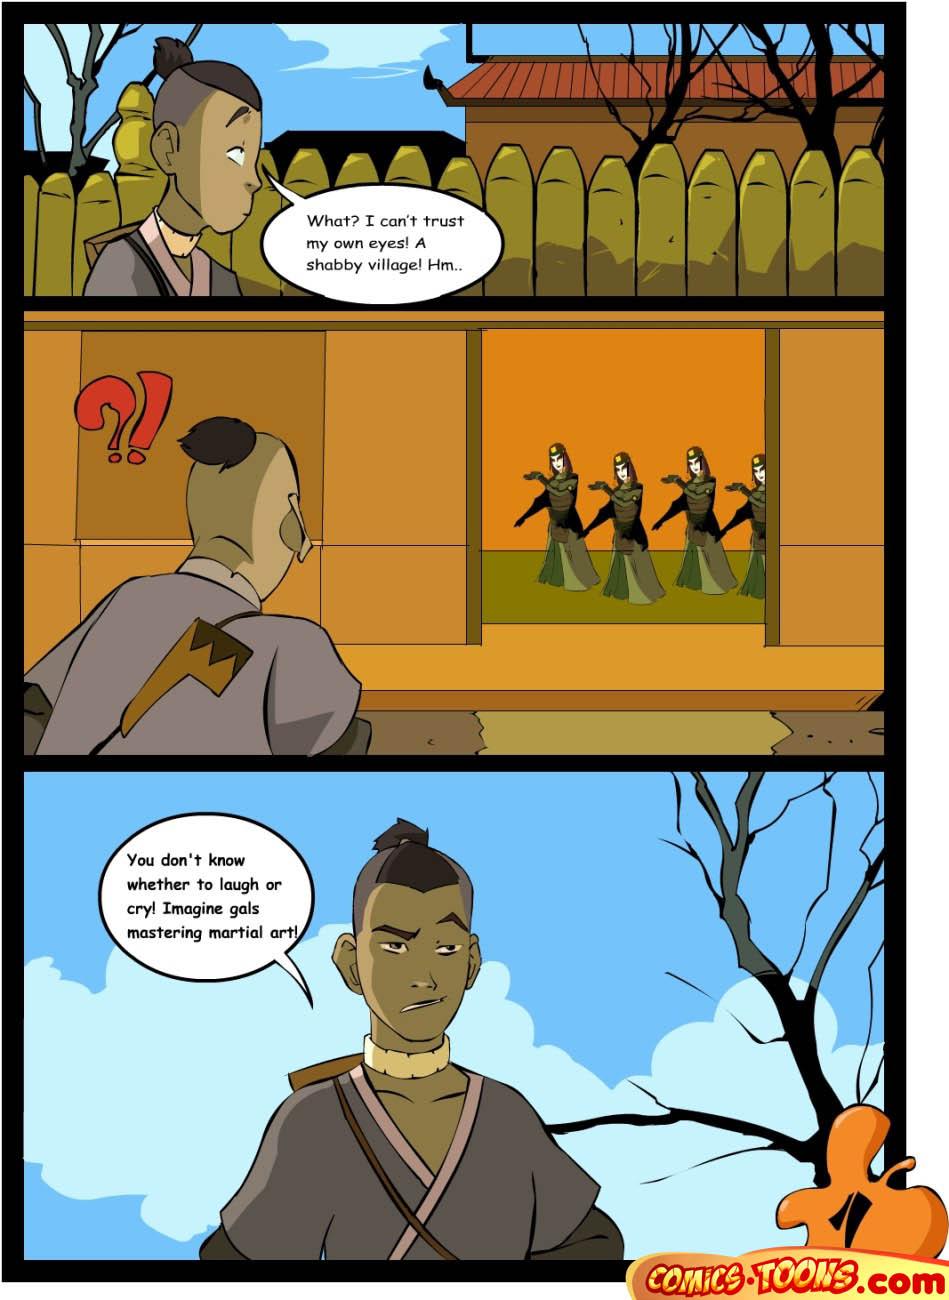 [Okunev] Avatar the Last Airbender